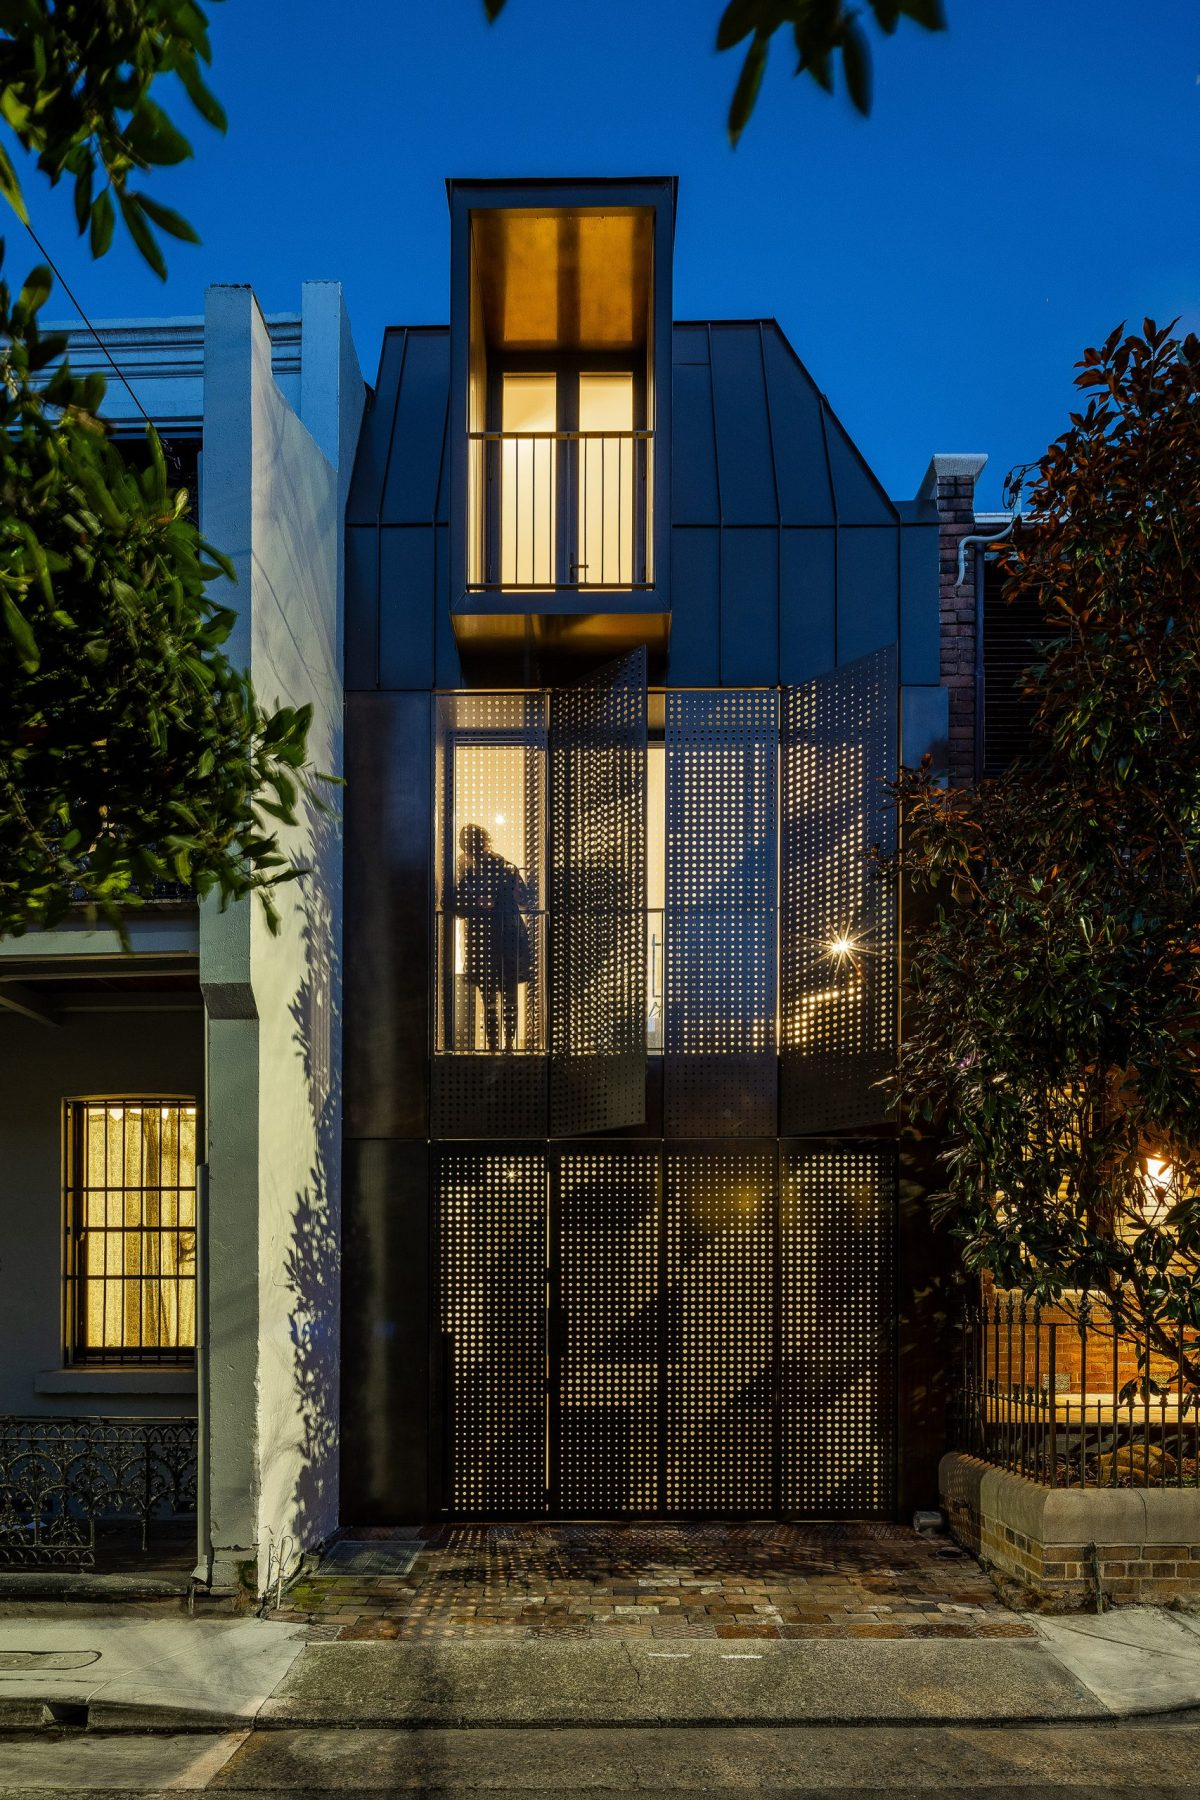 Chimney-house-atelier-dau-sydney_dezeen_2364_col_0-scaled-1